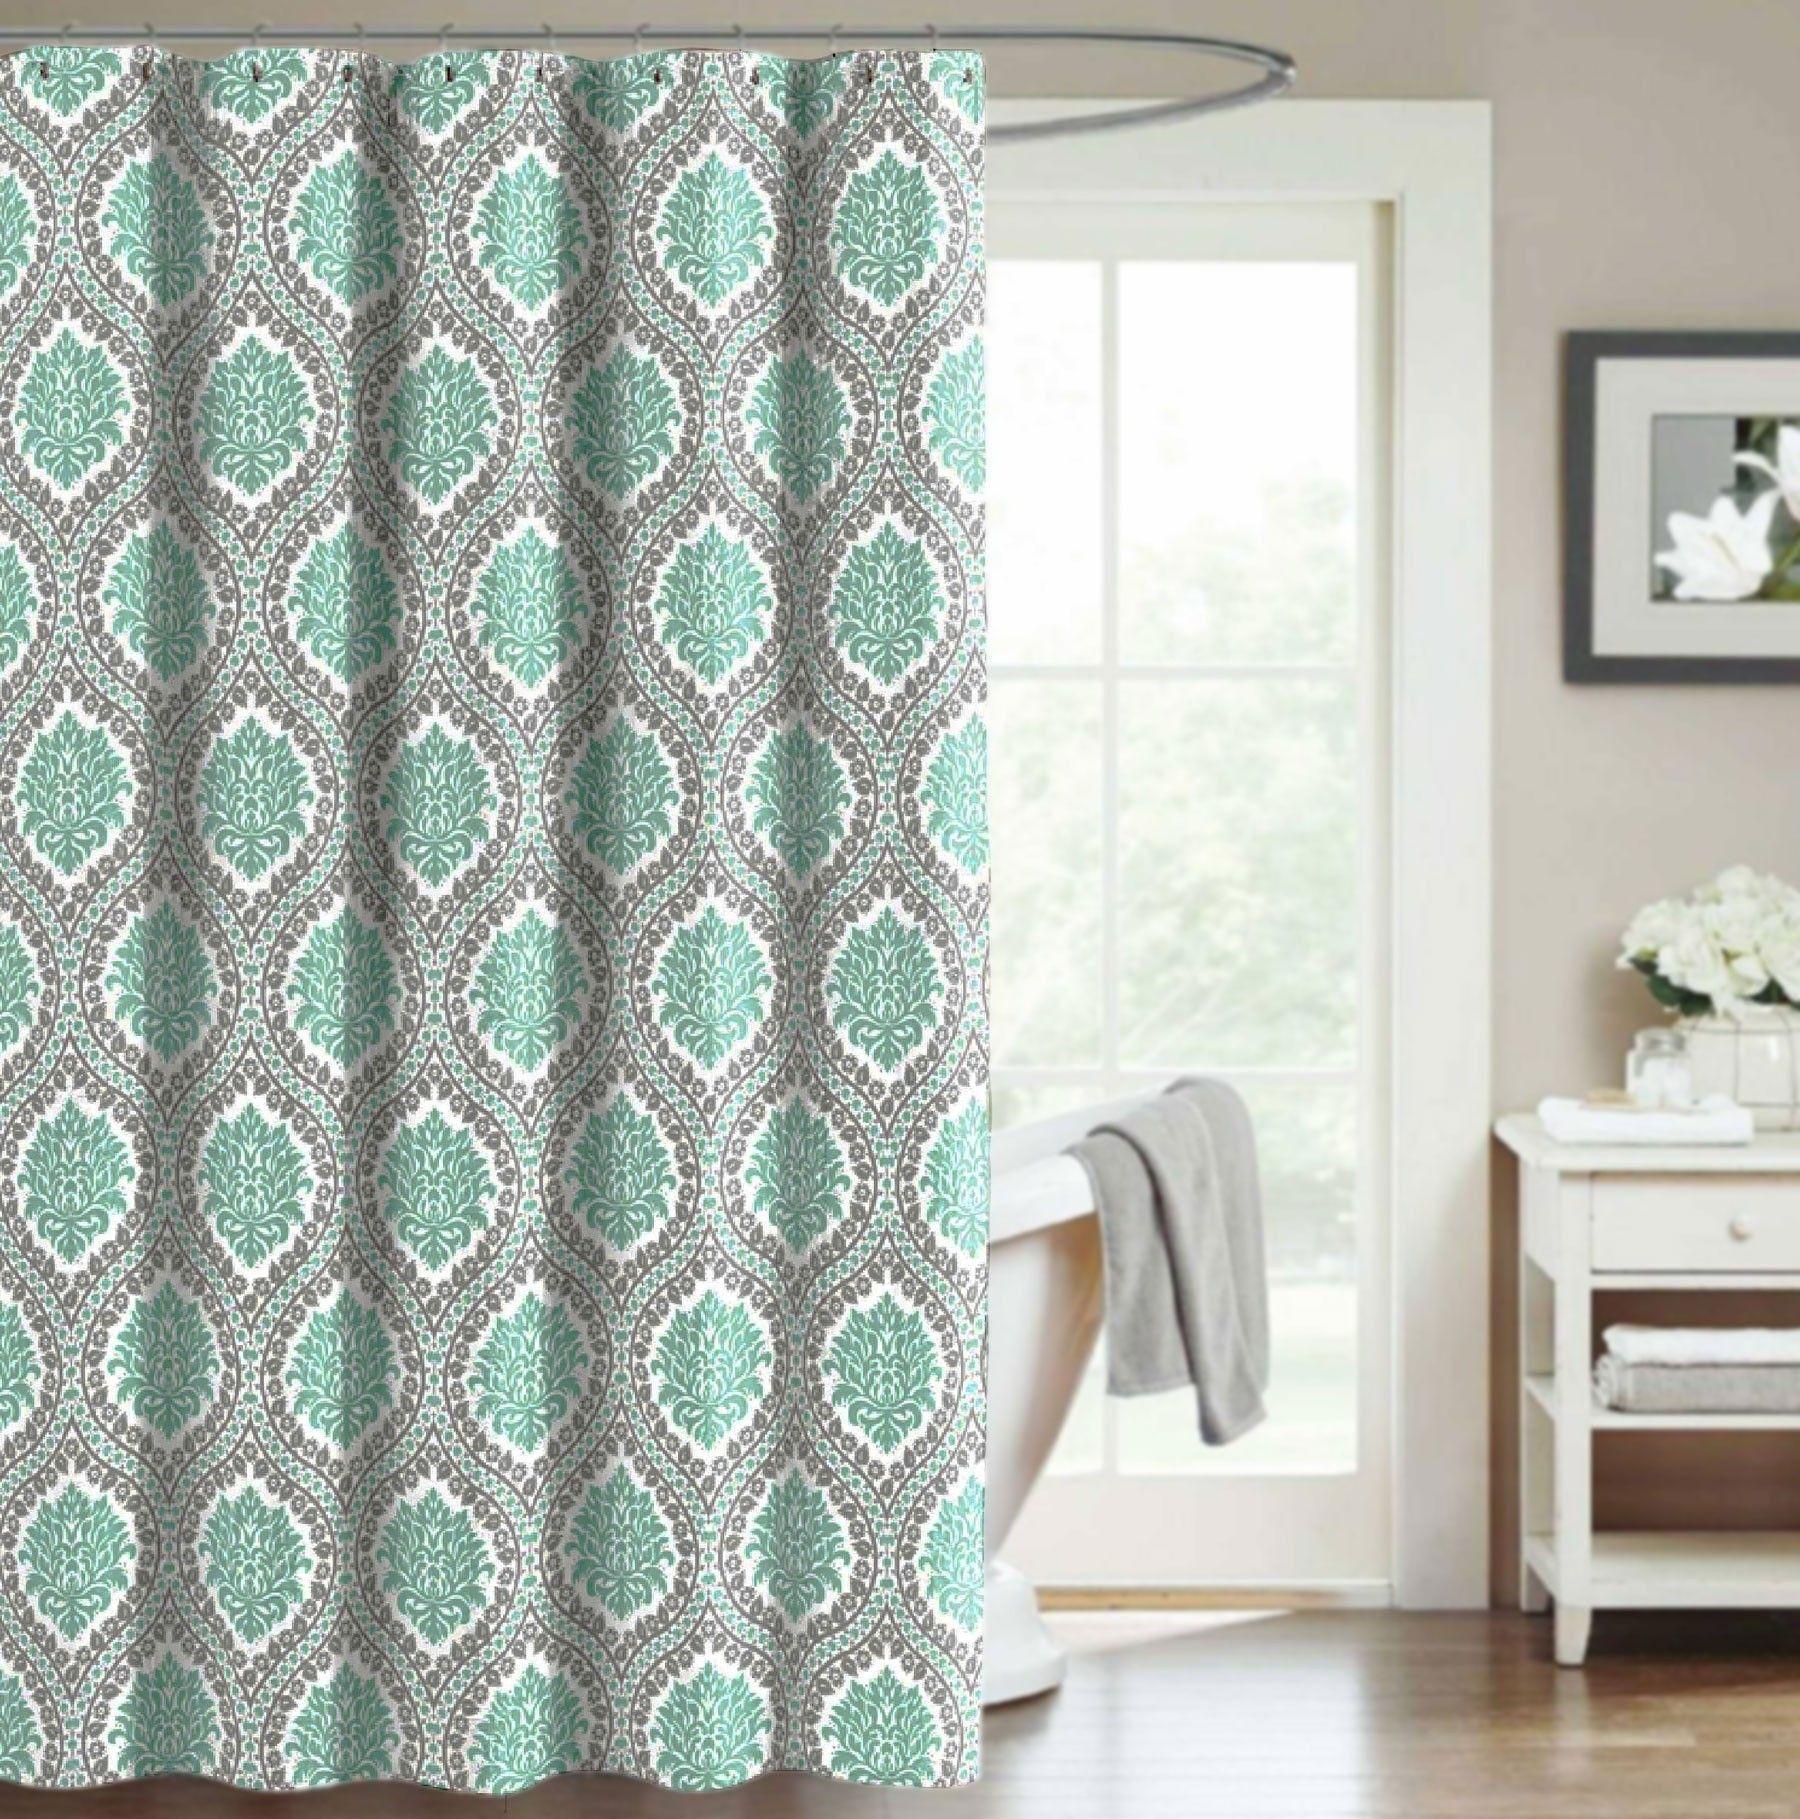 Crest Home Bellavista Fabric Shower Curtain Teal Gray Medallion ...